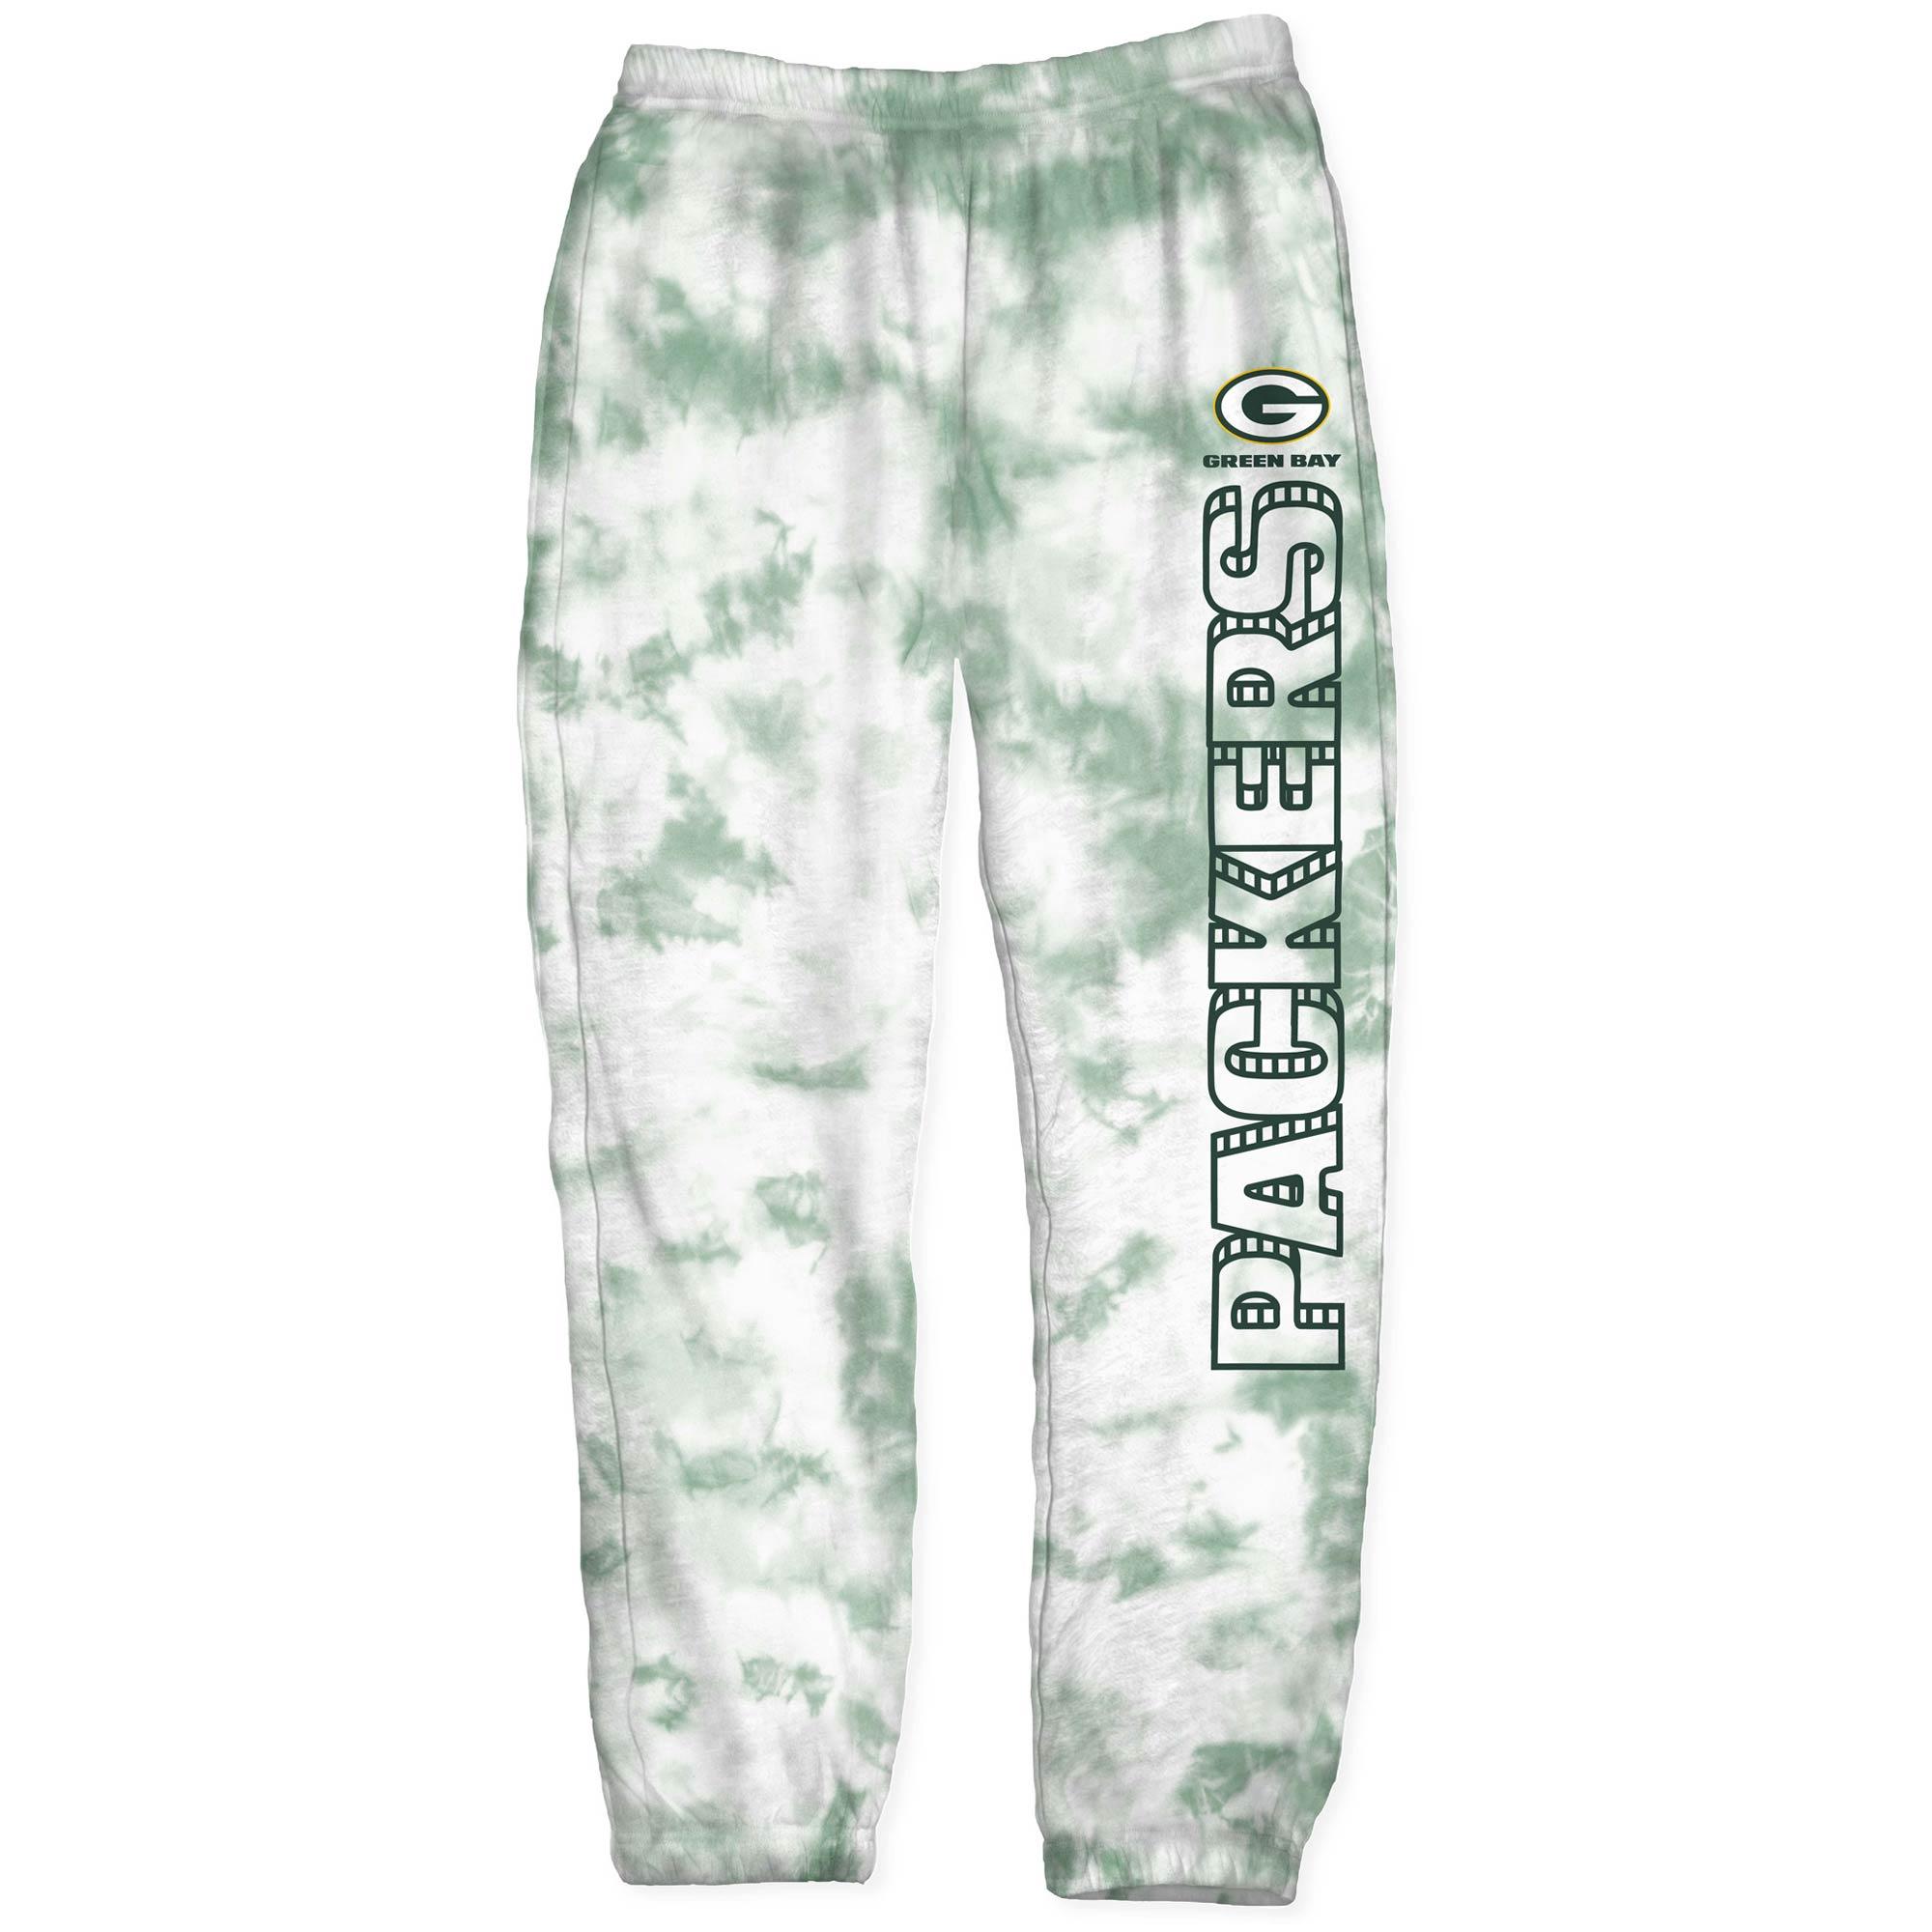 Green Bay Packers Junk Food Women's Tie-Dye Playoff Pants - Green